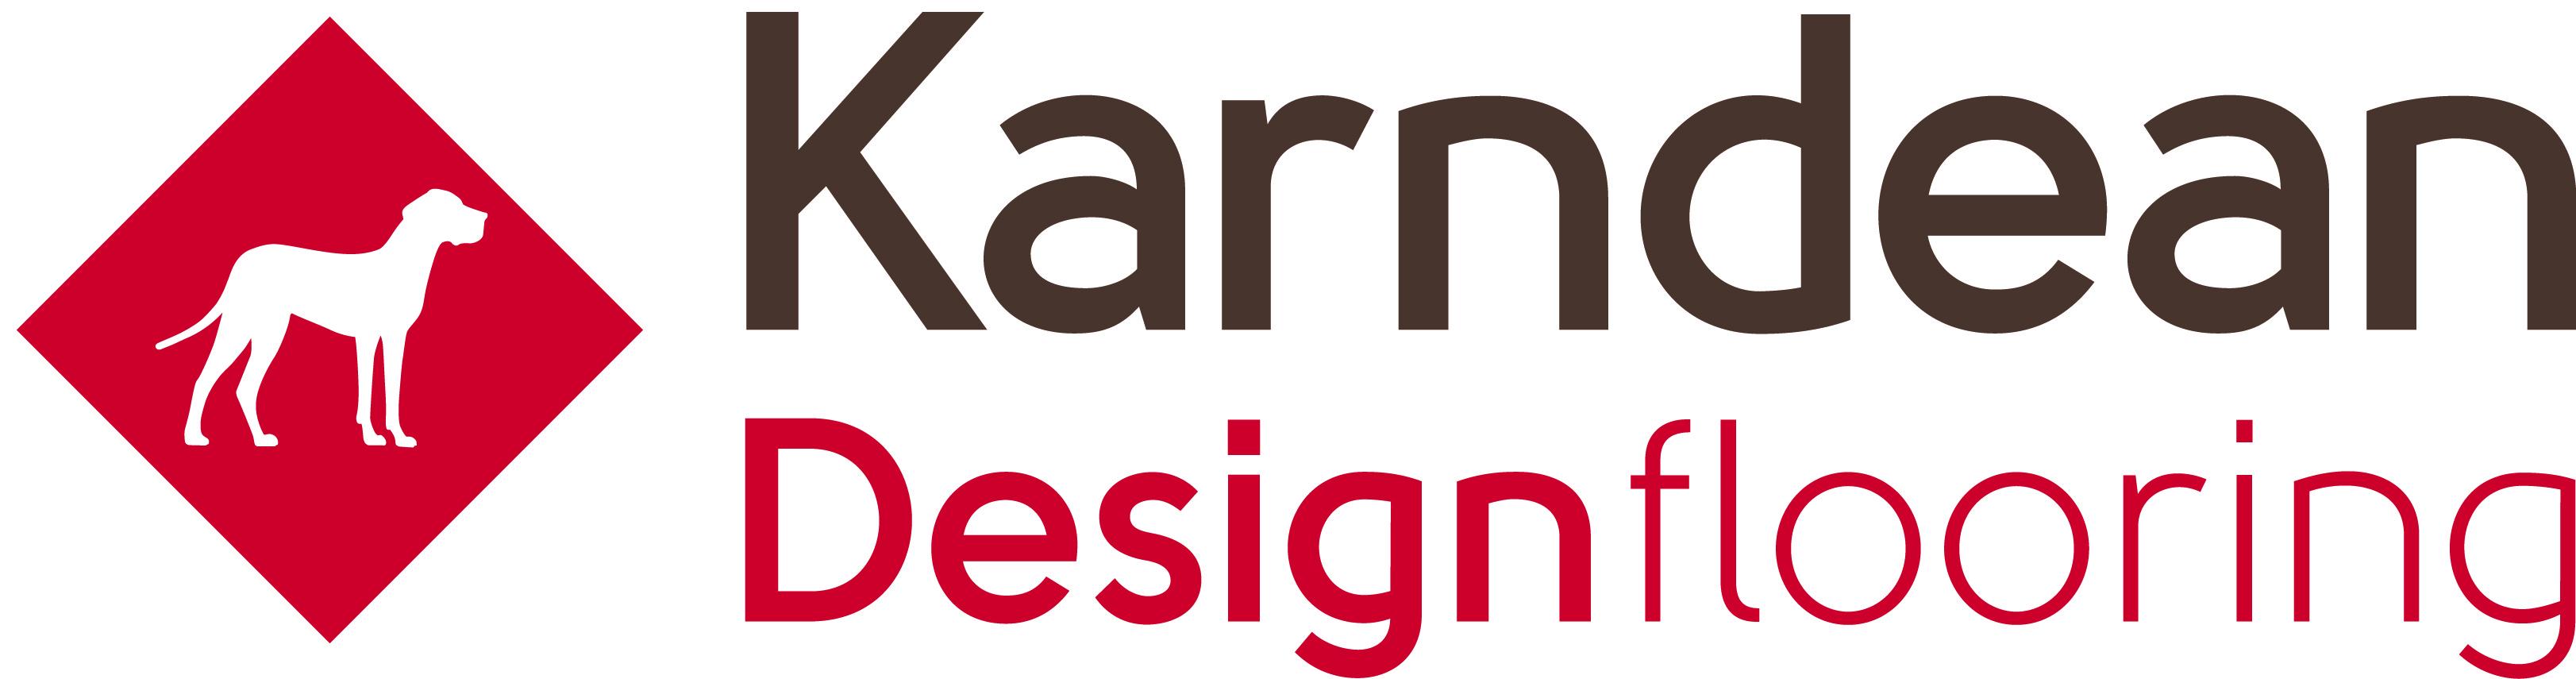 karndean-logo-2-col-on-white-background.jpg